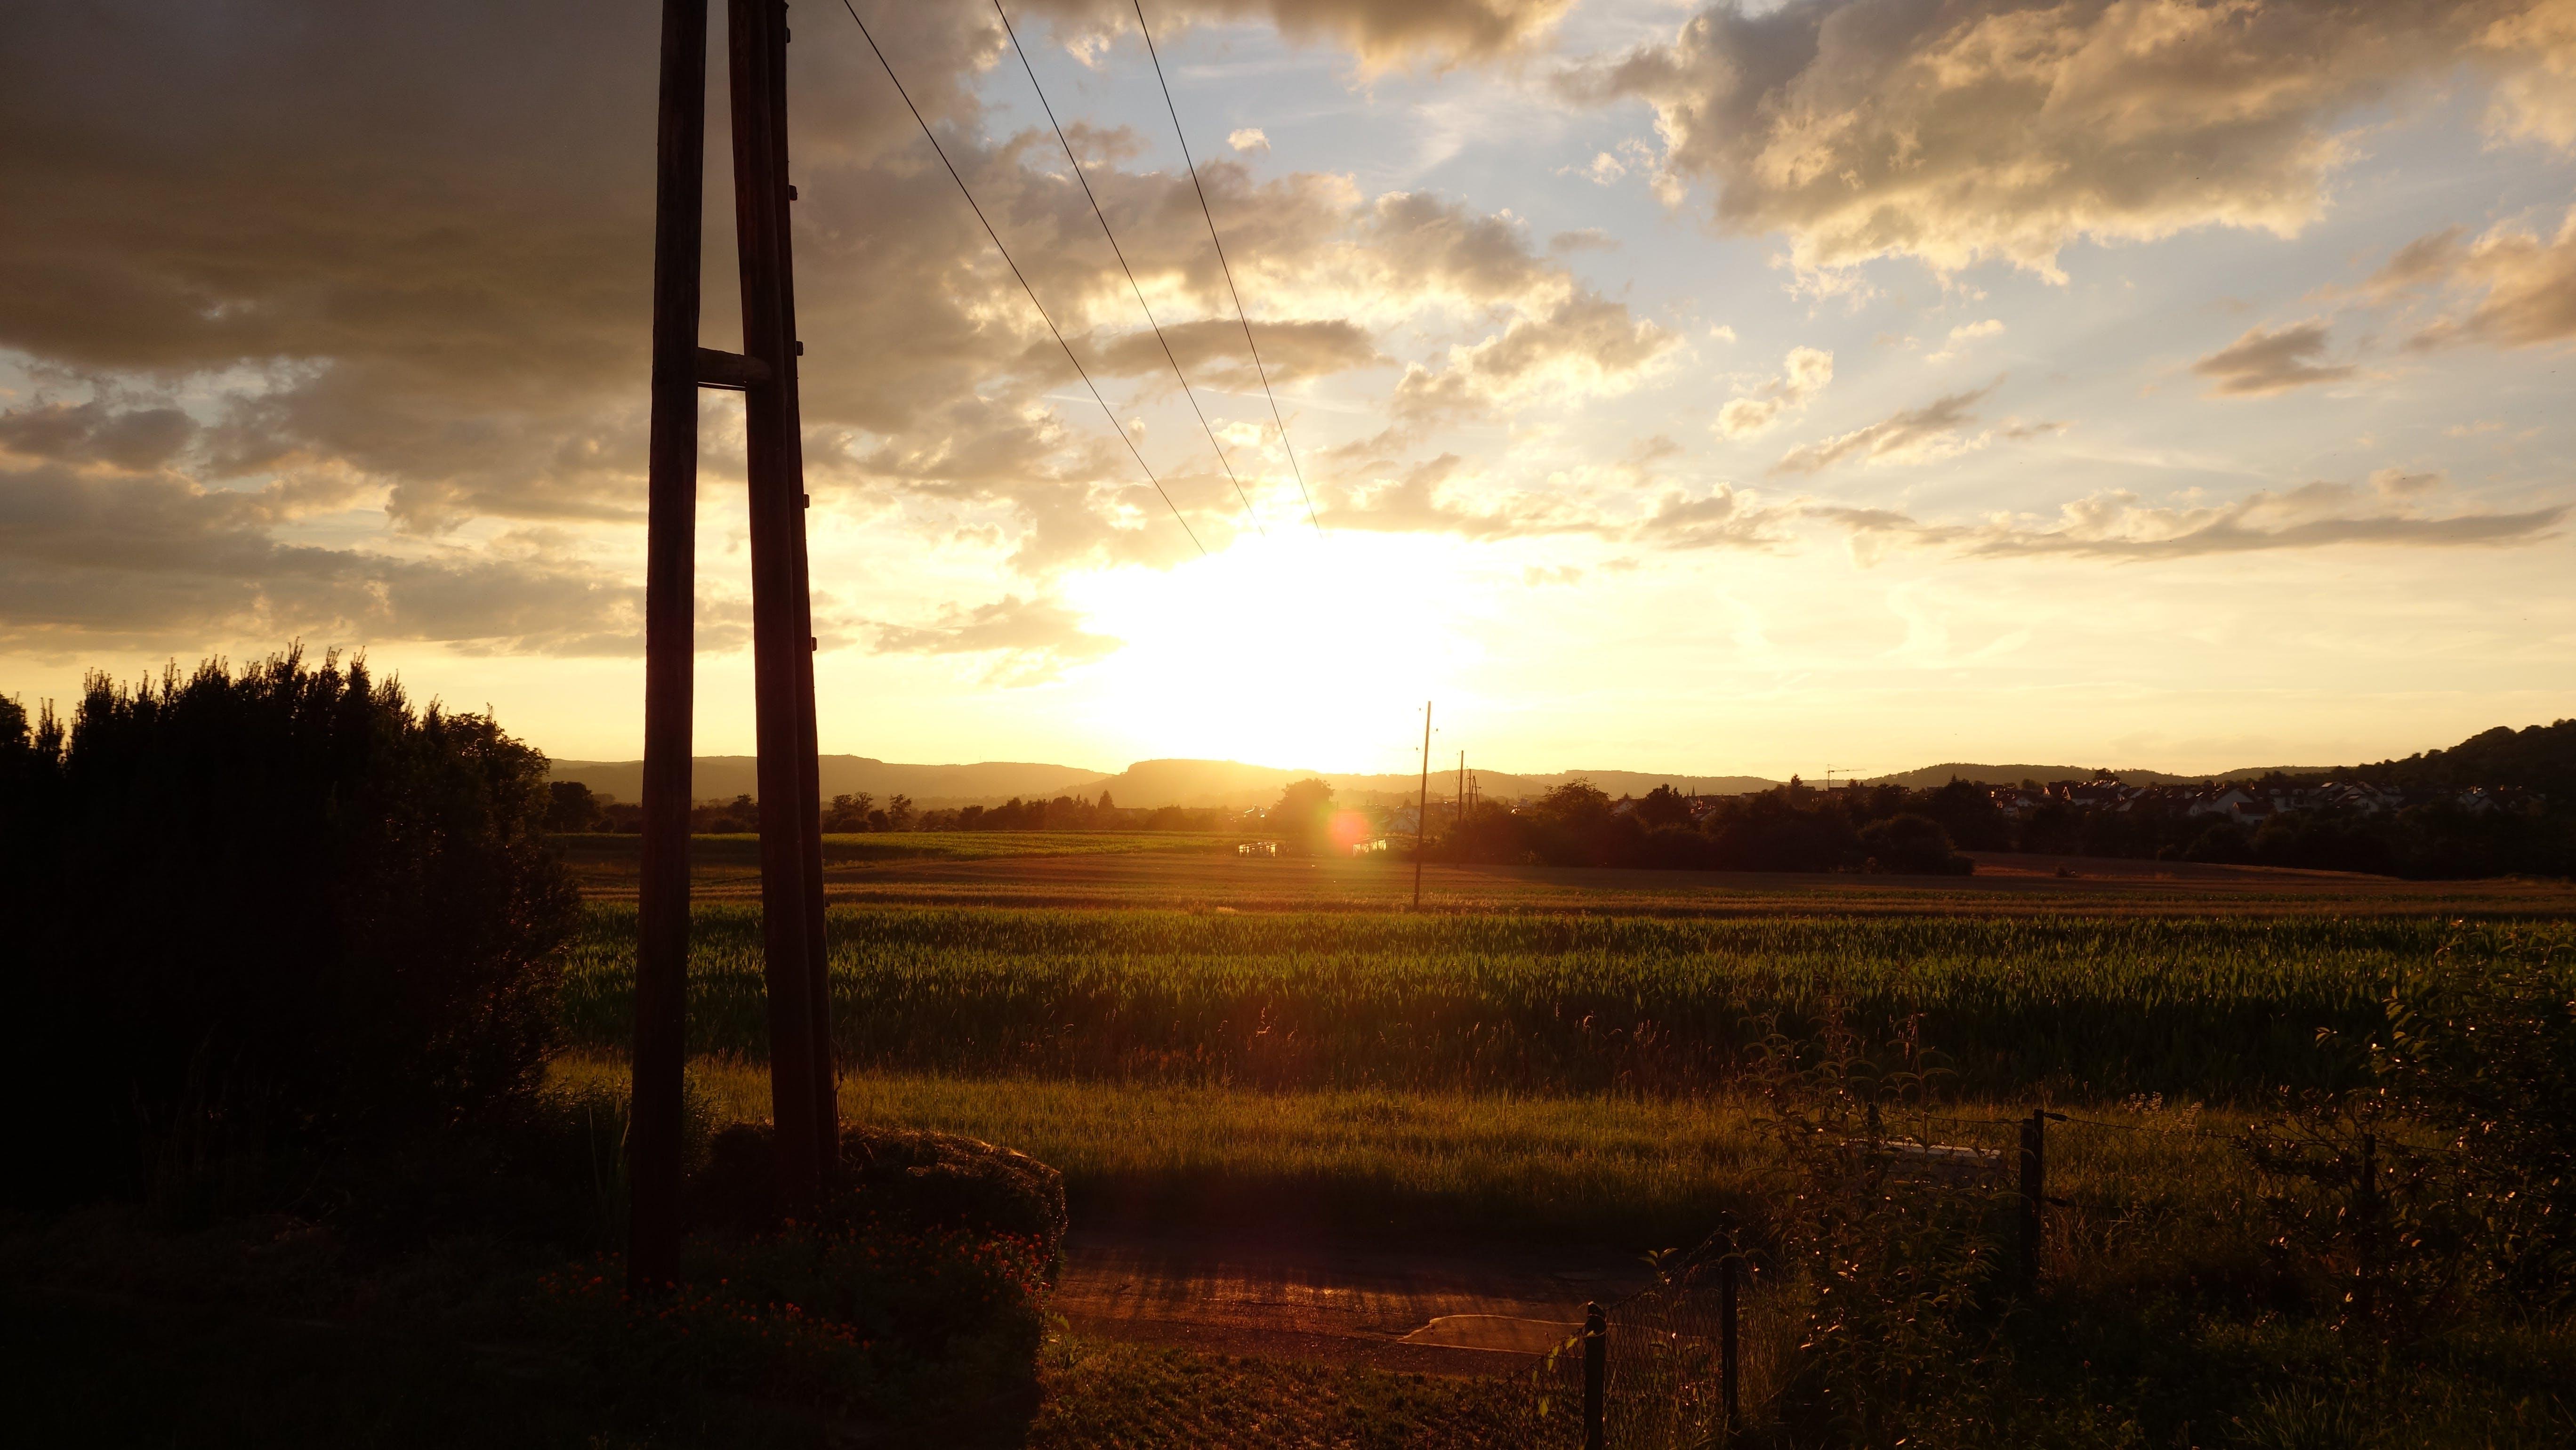 Green Field Landscape Photo during Sunrise